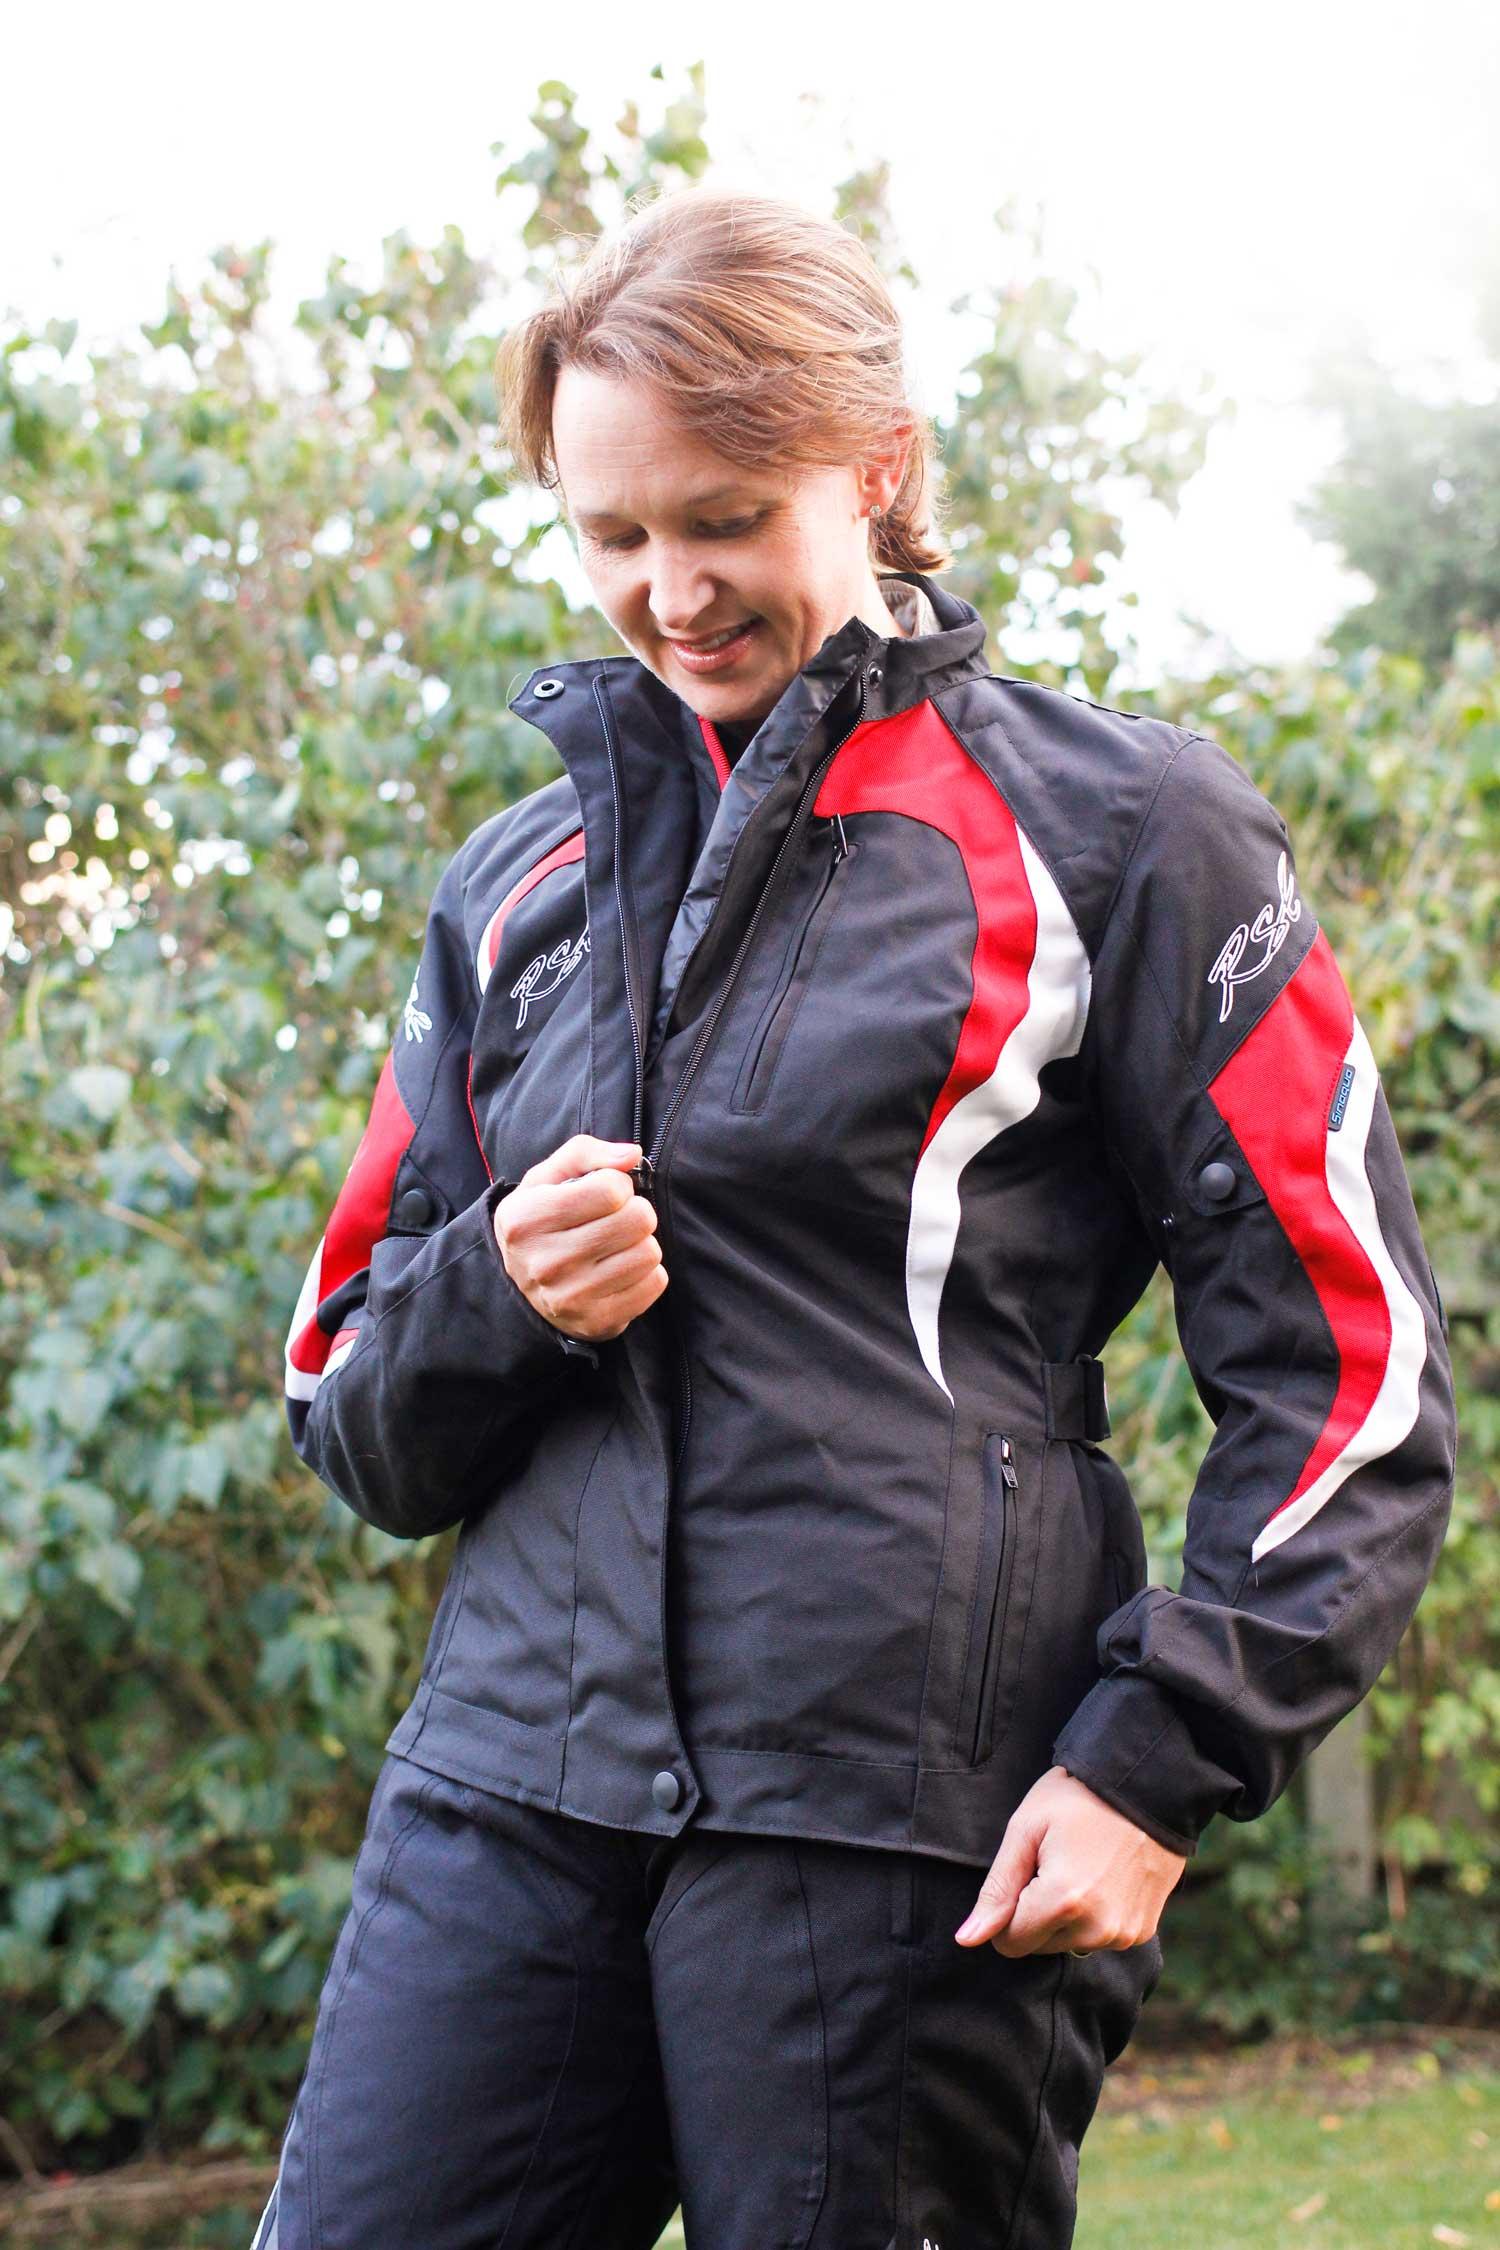 ARMR TSUMA textile motorcycle jacket | MoreBikes